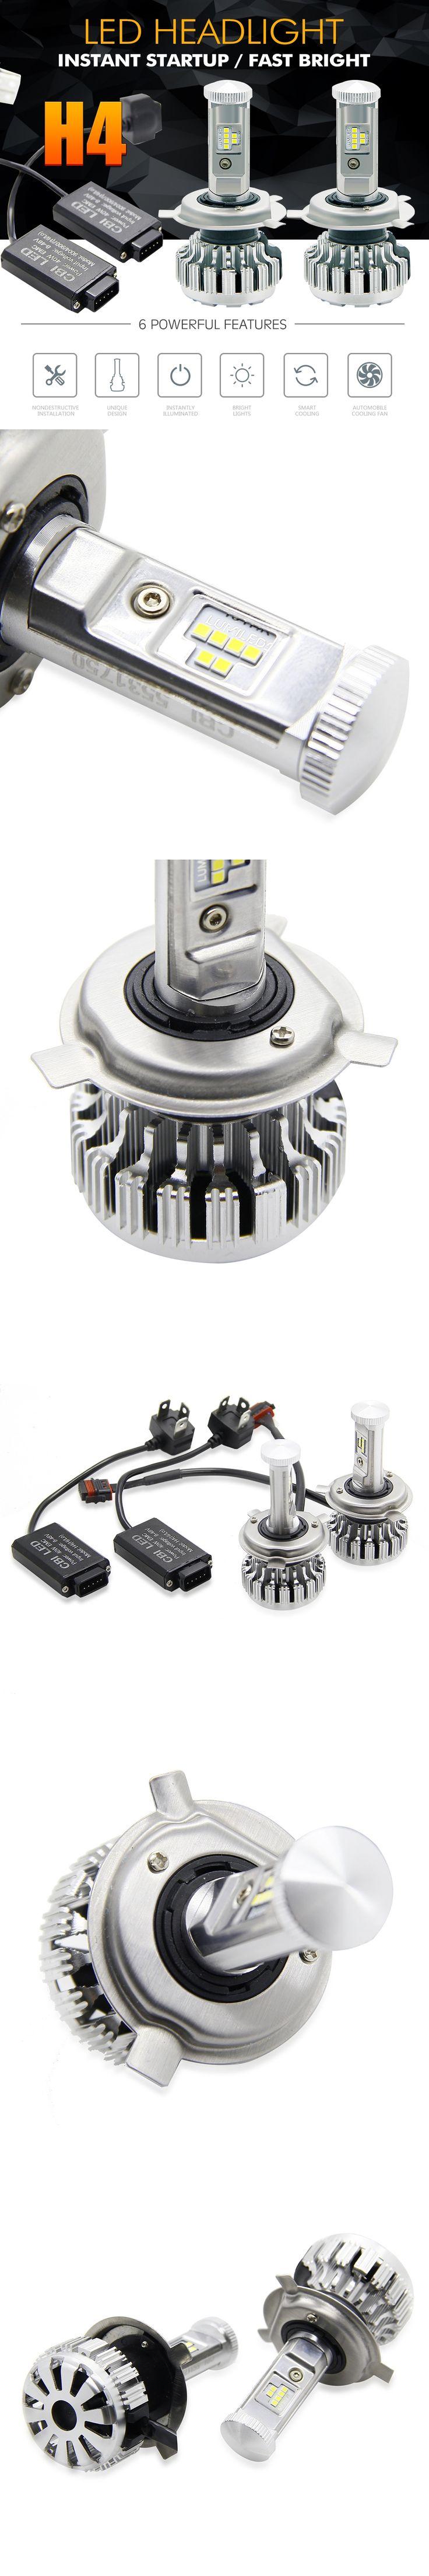 ZOYE H4 LED Car Headlight Bulb Hi-Lo Beam 80W 6500K 8000LM PHILIPS Chips automobiles external light led 12V